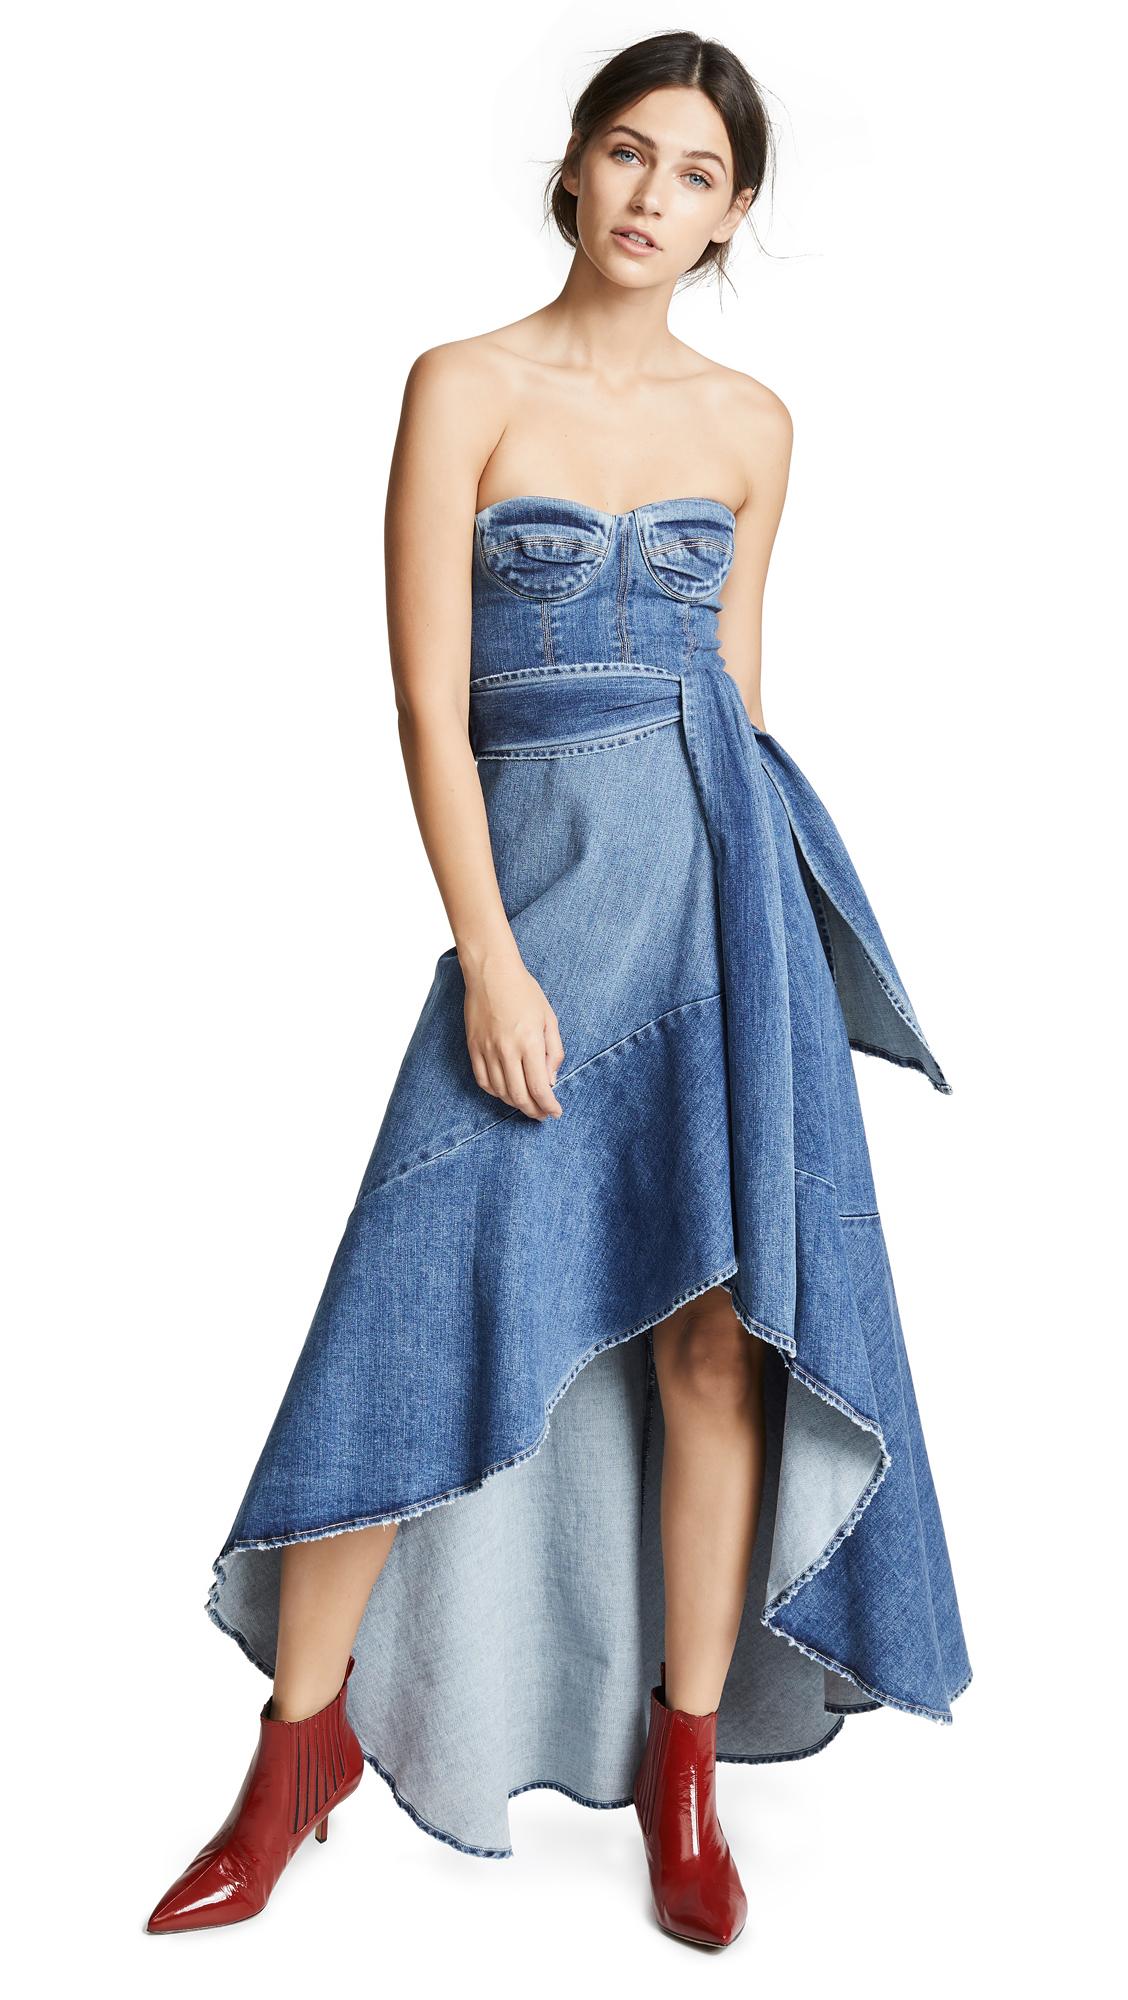 Jonathan Simkhai Classic Denim Bustier Dress